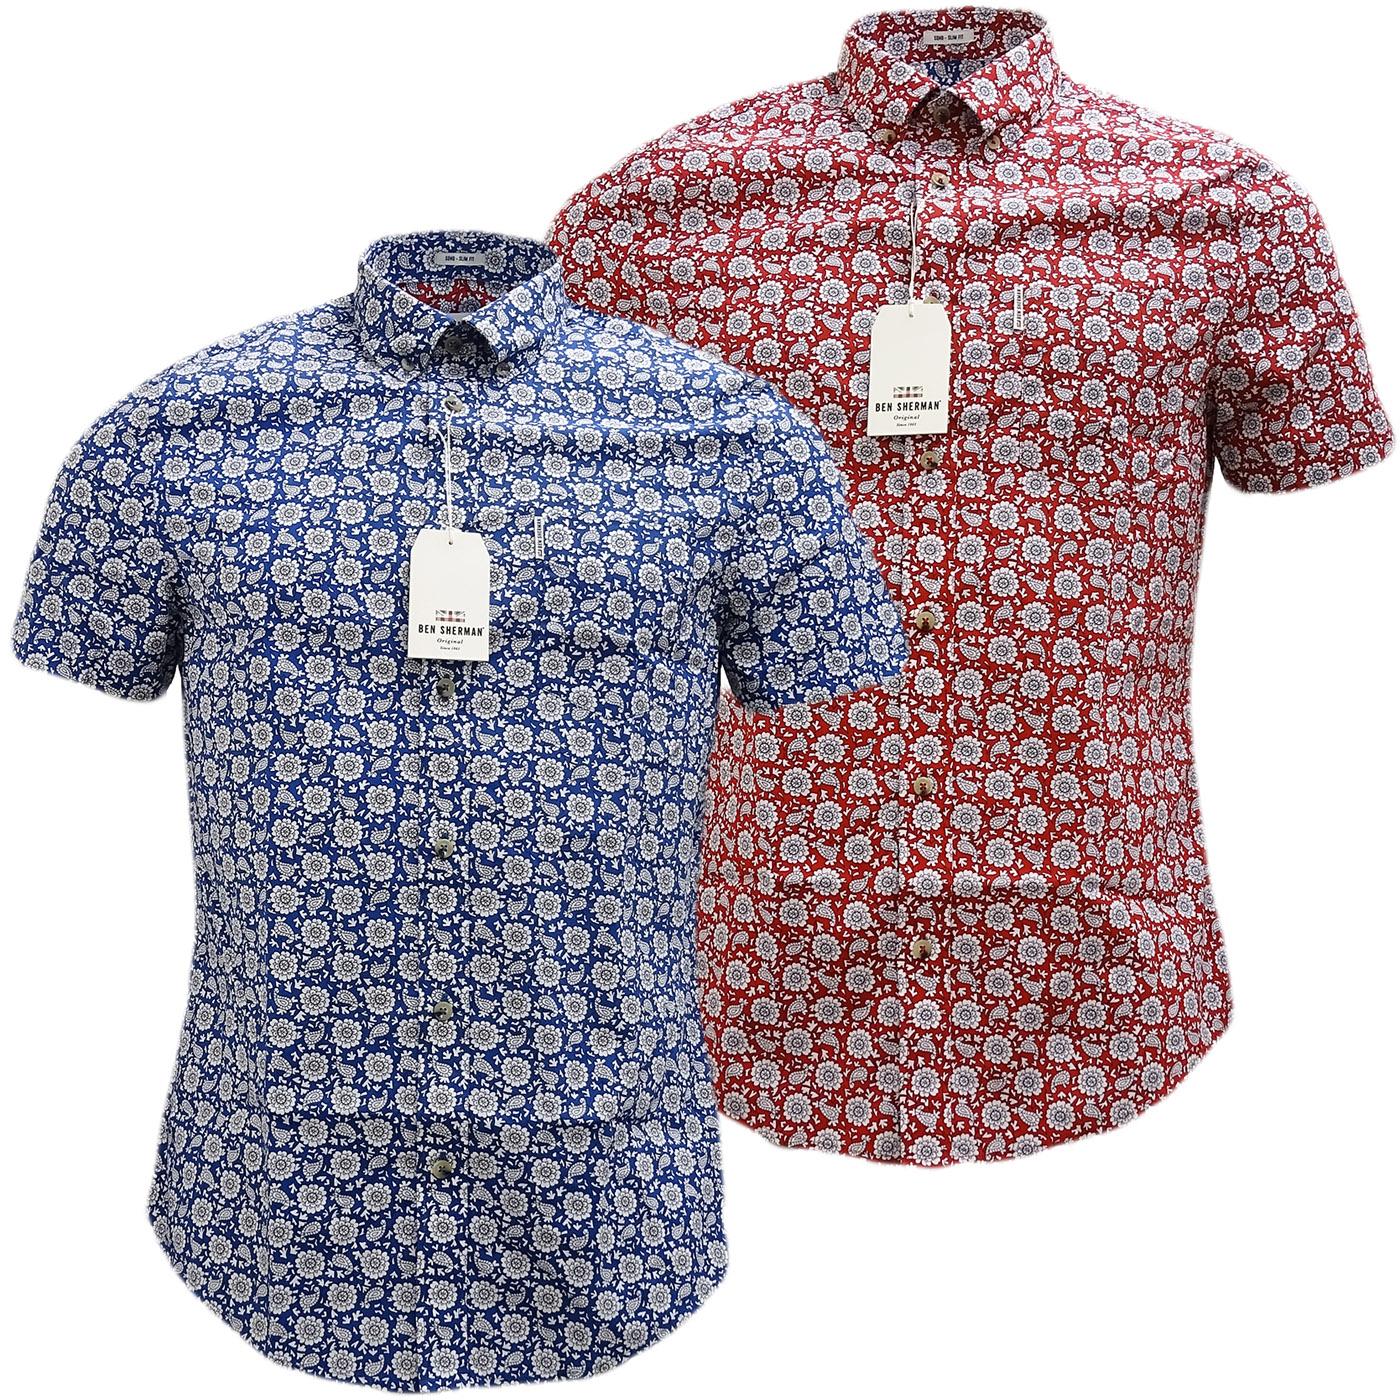 26063bbbca Sentinel Mens Shirts by Ben Sherman (Ma13378) -  NEW